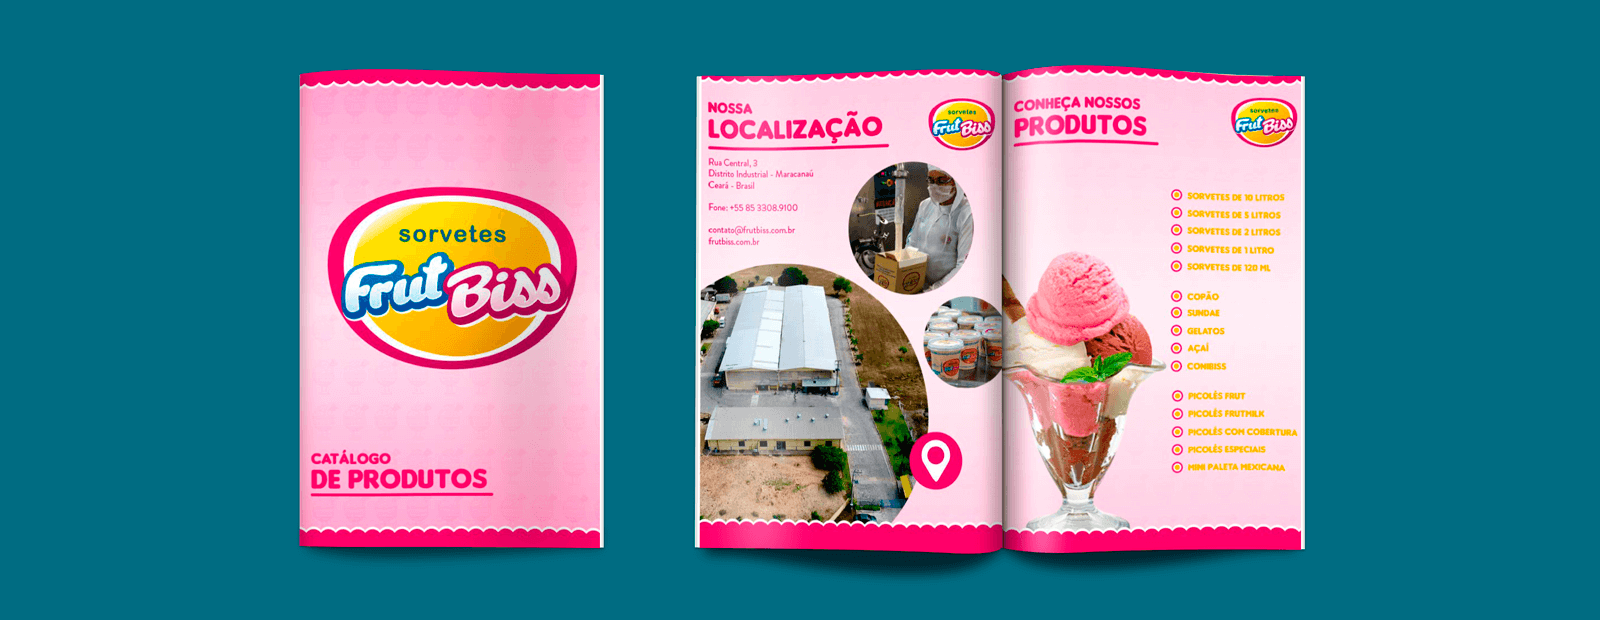 catalogo-frutbiss